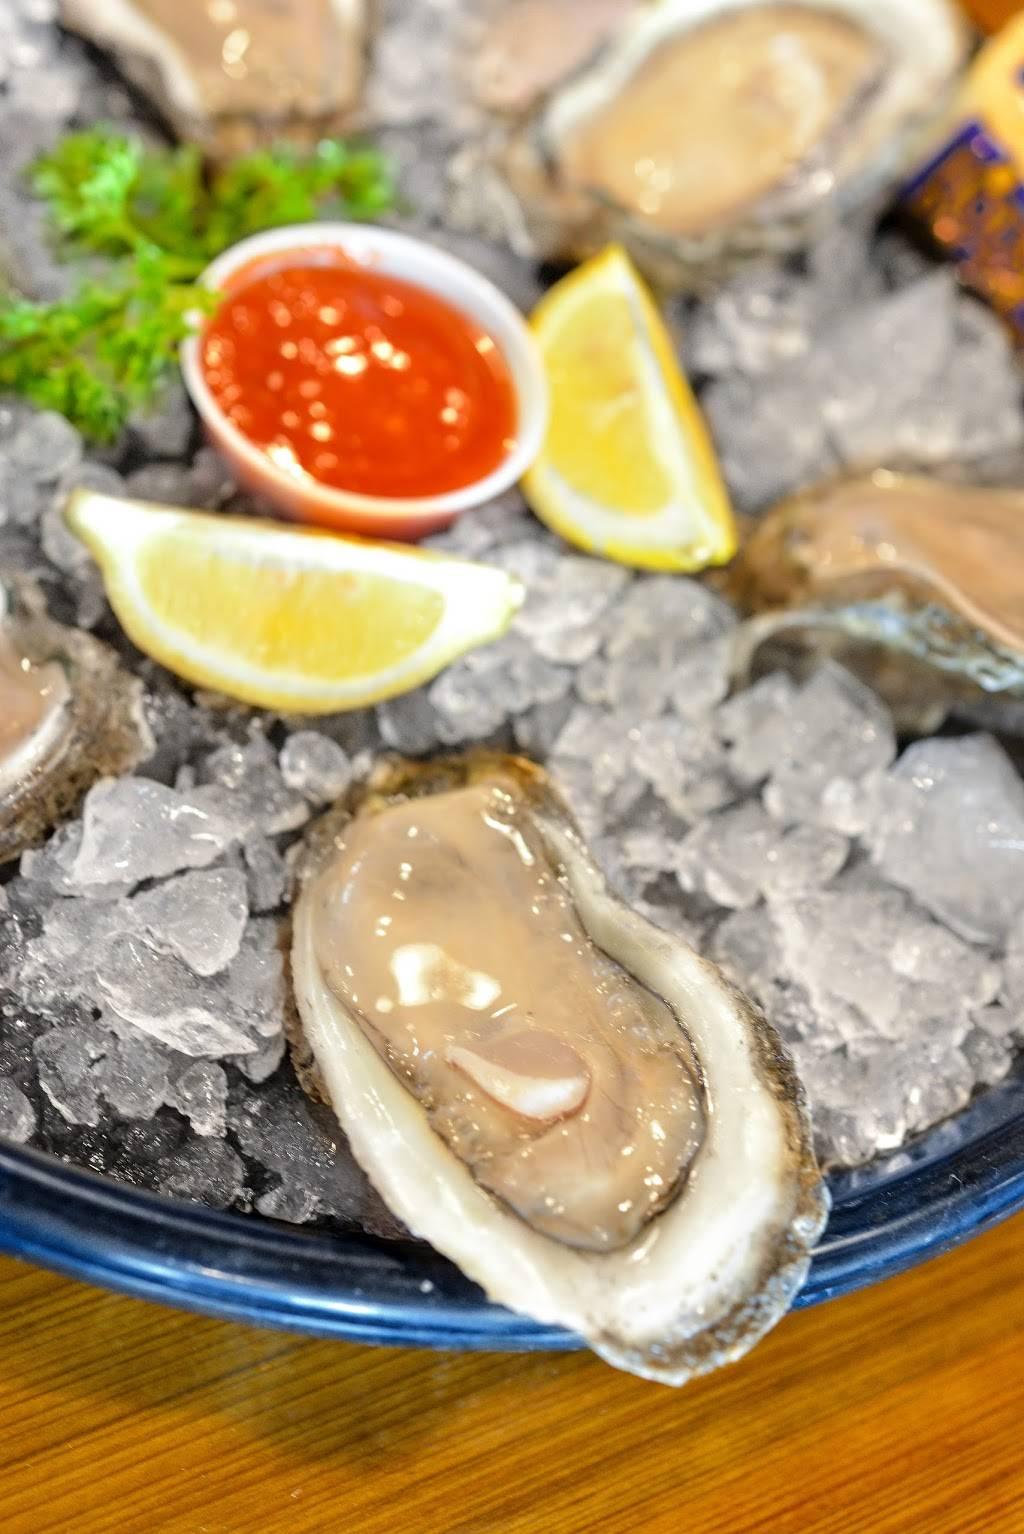 The Bullfish Bar Kitchen Restaurant 4001 Nicholson Dr Ste D Baton Rouge La 70808 Usa